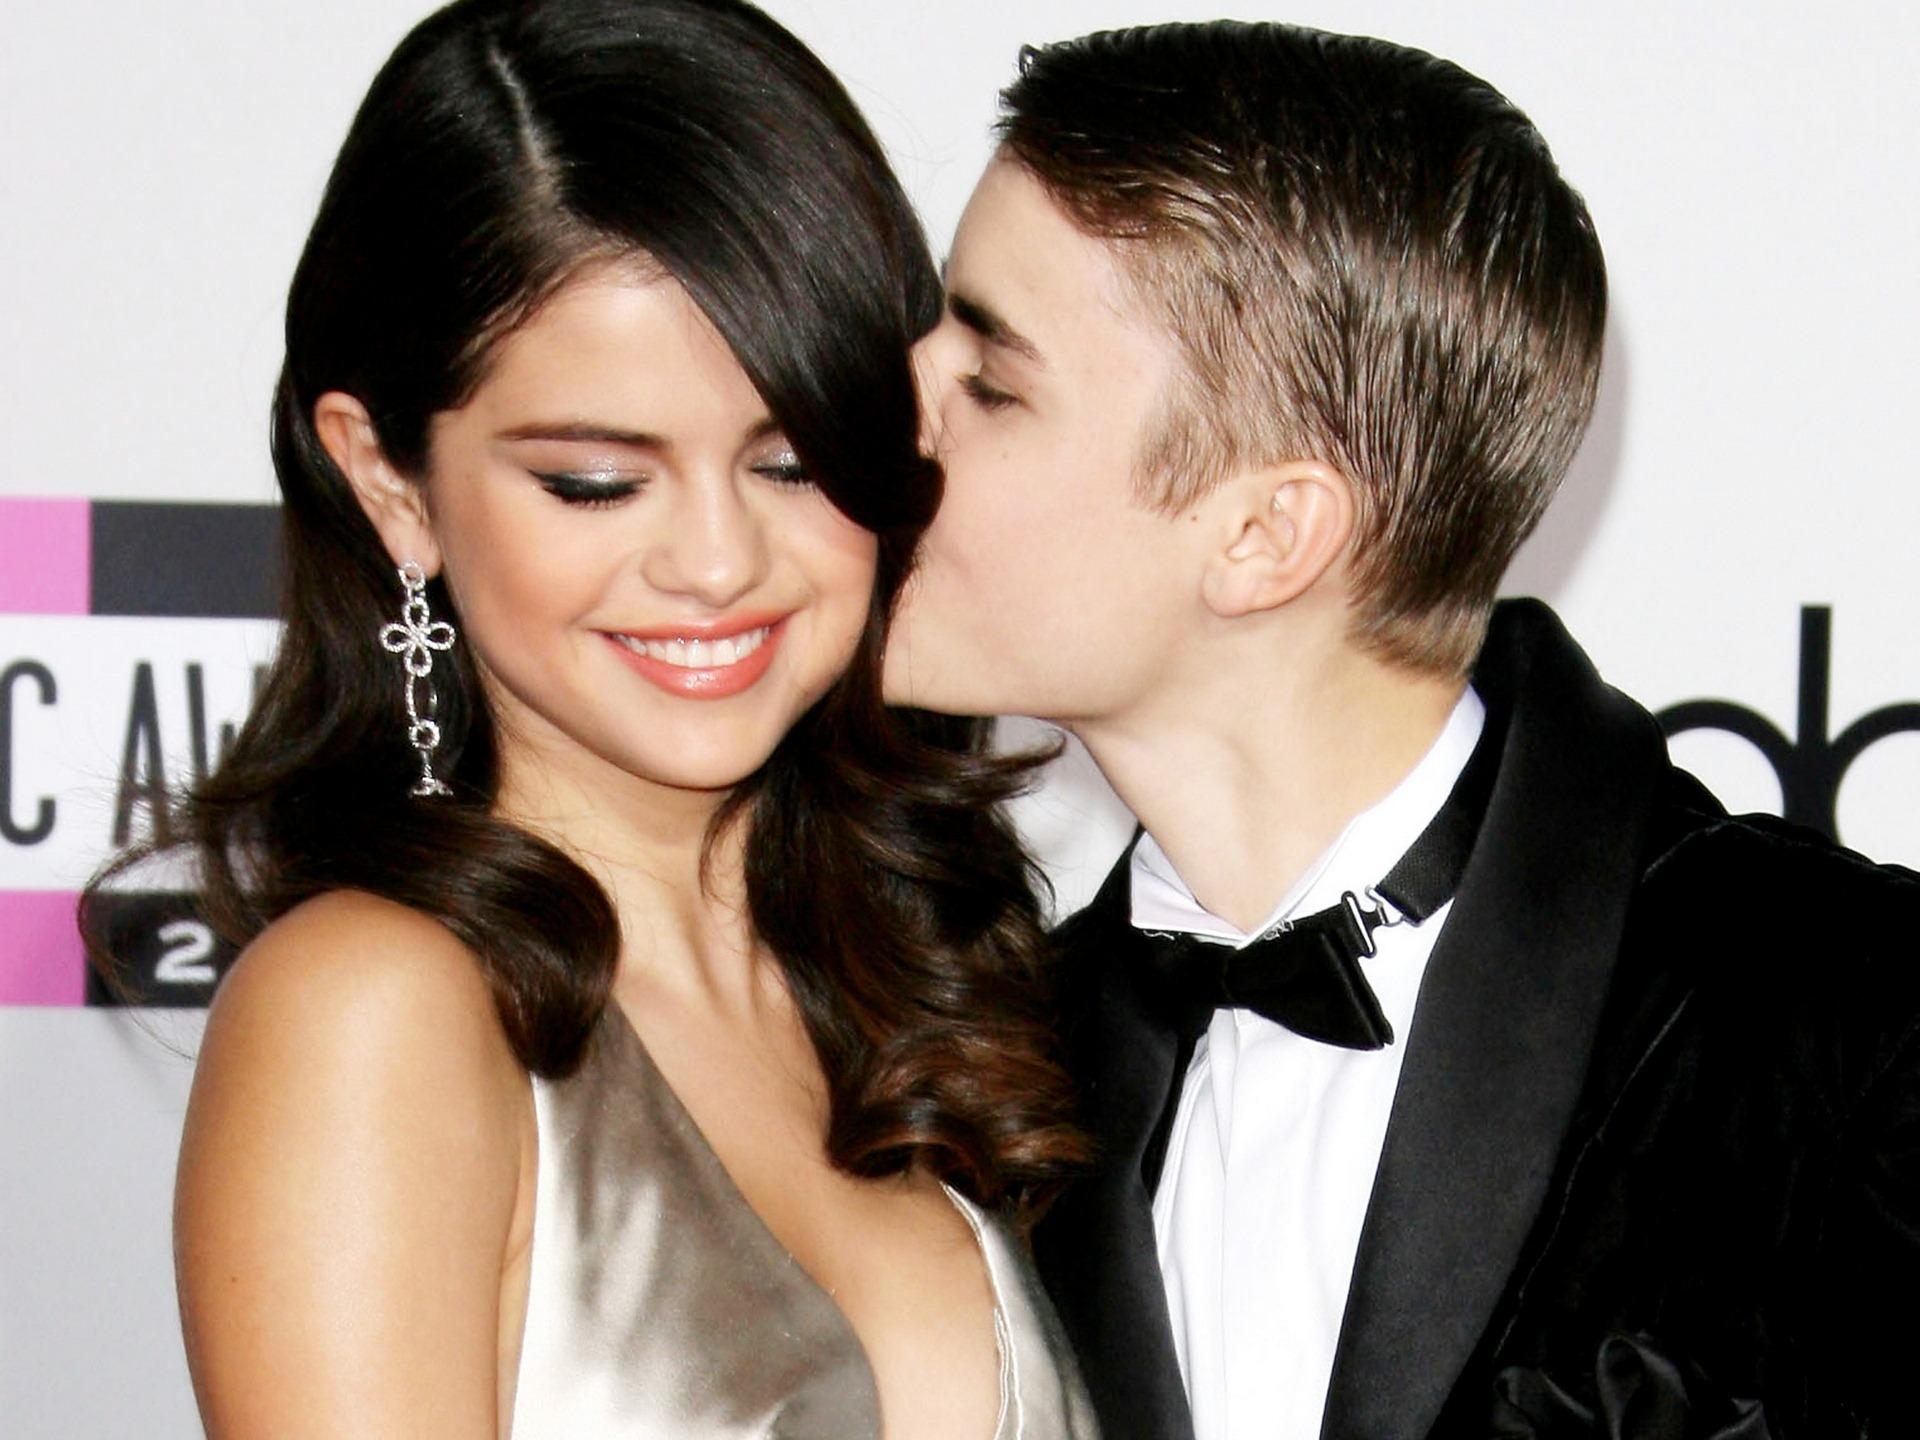 Justin Bieber - Wikipedia, the free encyclopedia